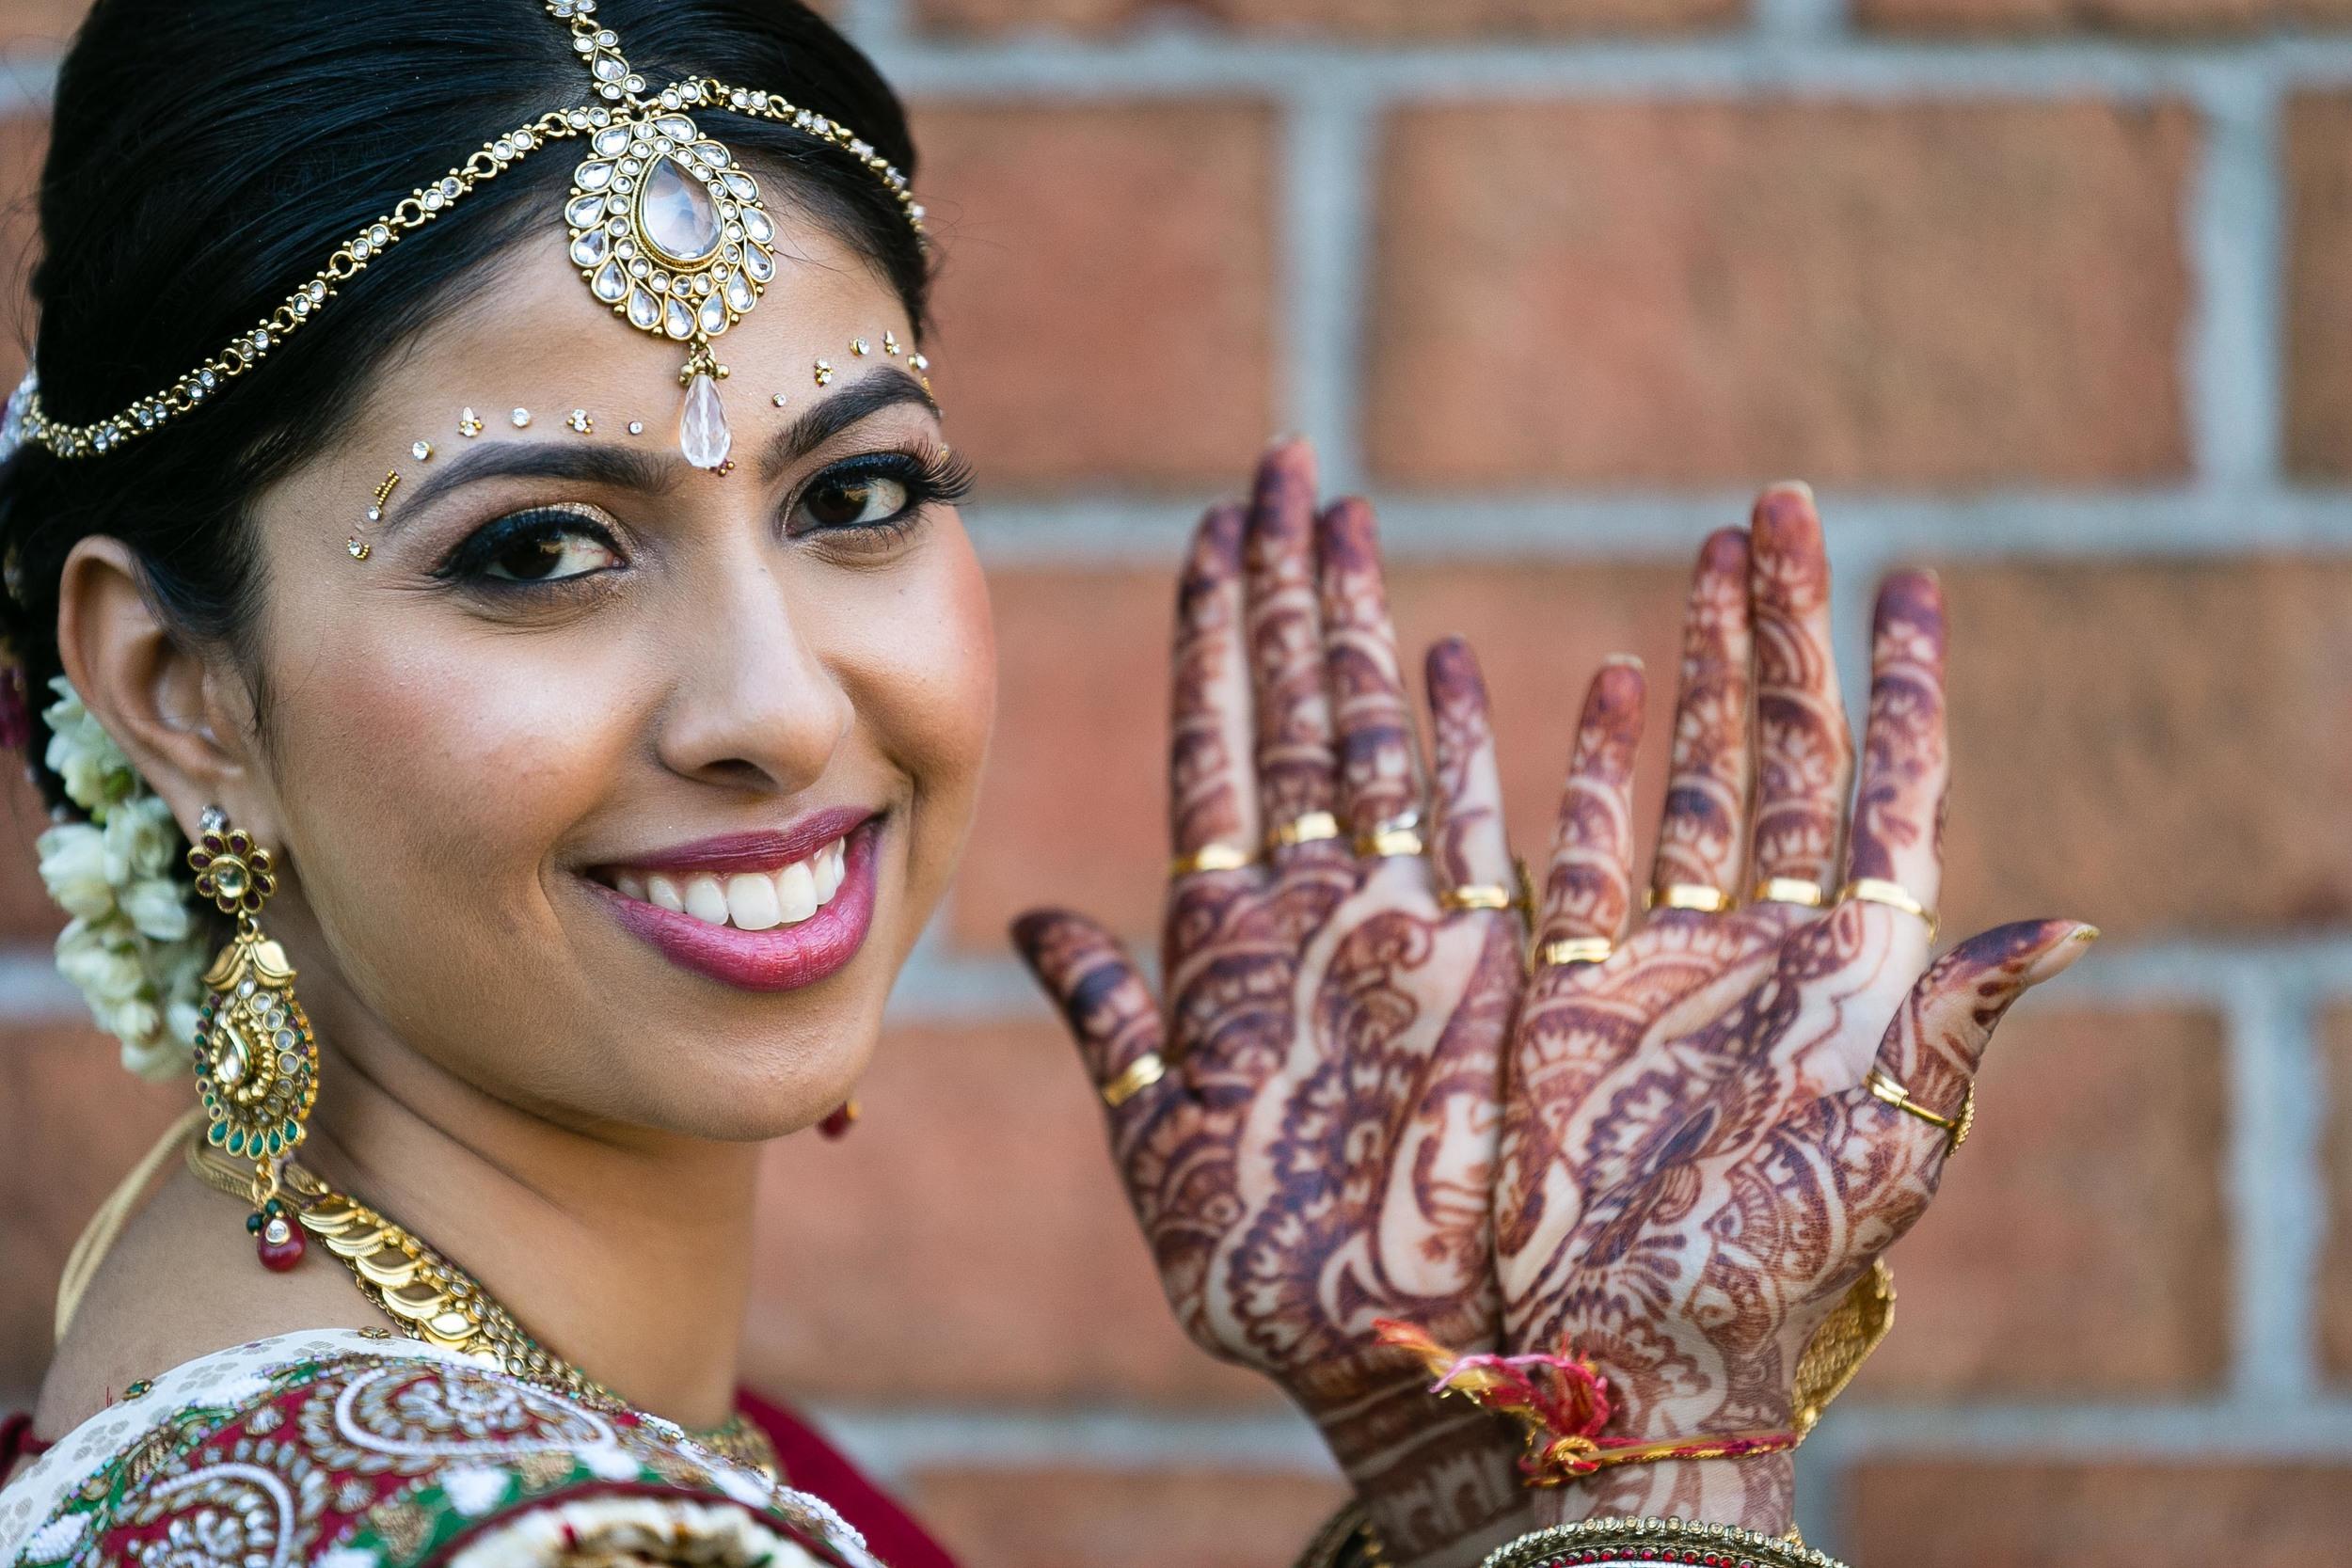 Luxurious-Indian-Wedding-Marriott-Boston-Massachusetts-Documentary-Wedding-Photography-by-Jacek-Dolata-7.jpg